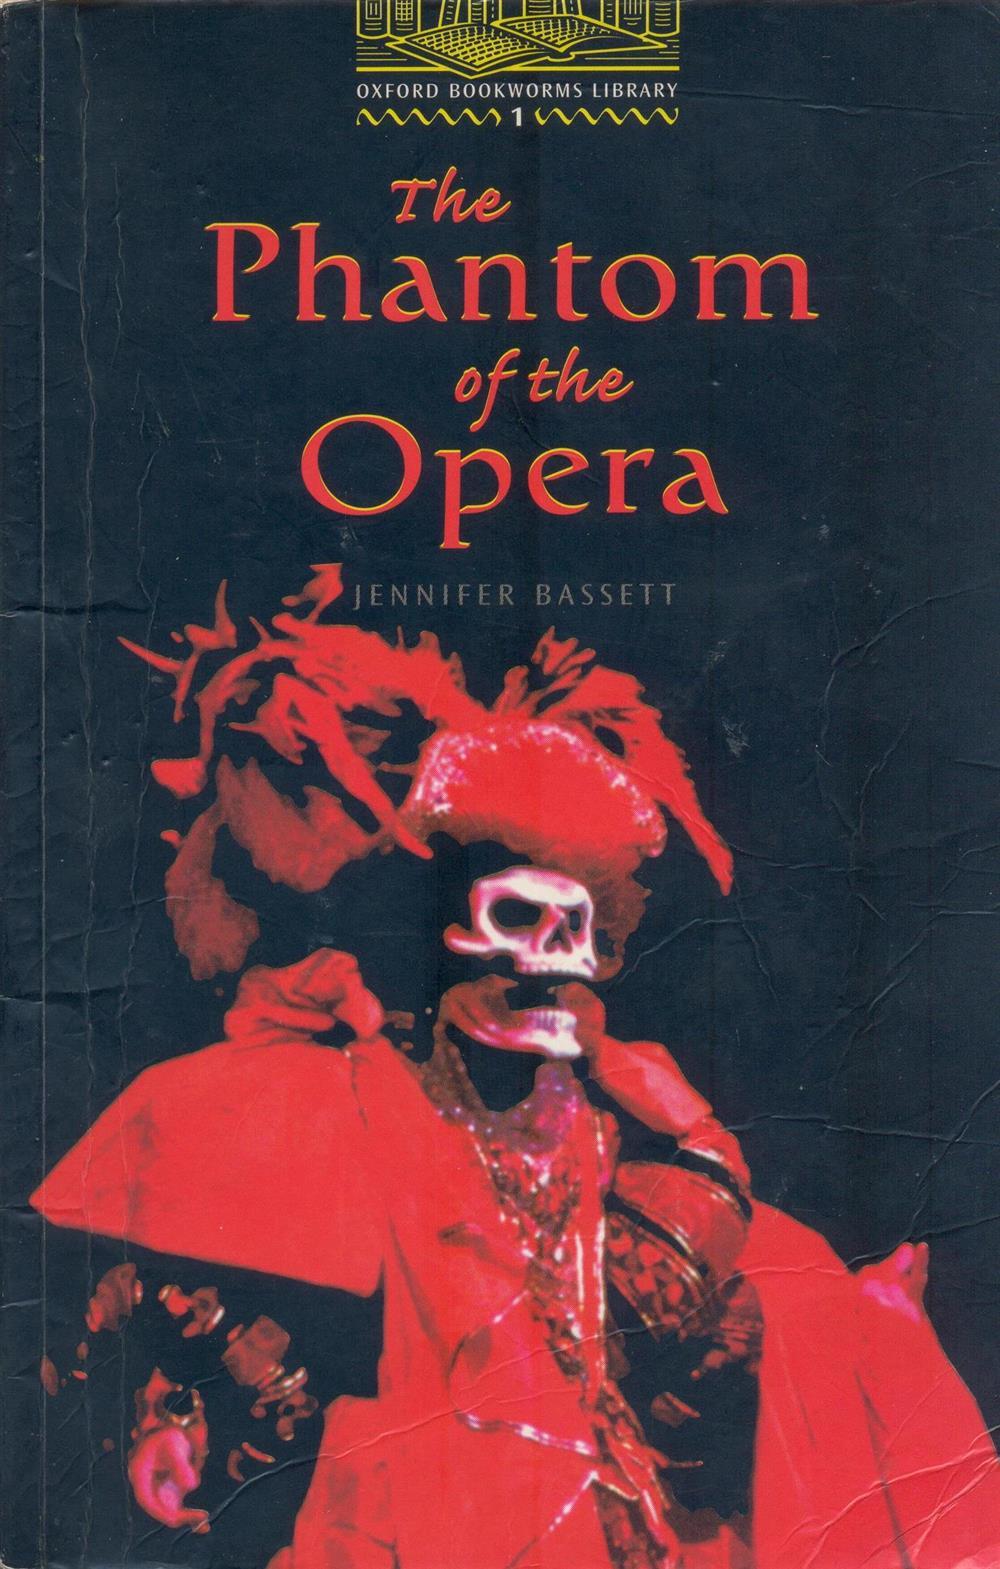 The phantom of the opera 001.jpg